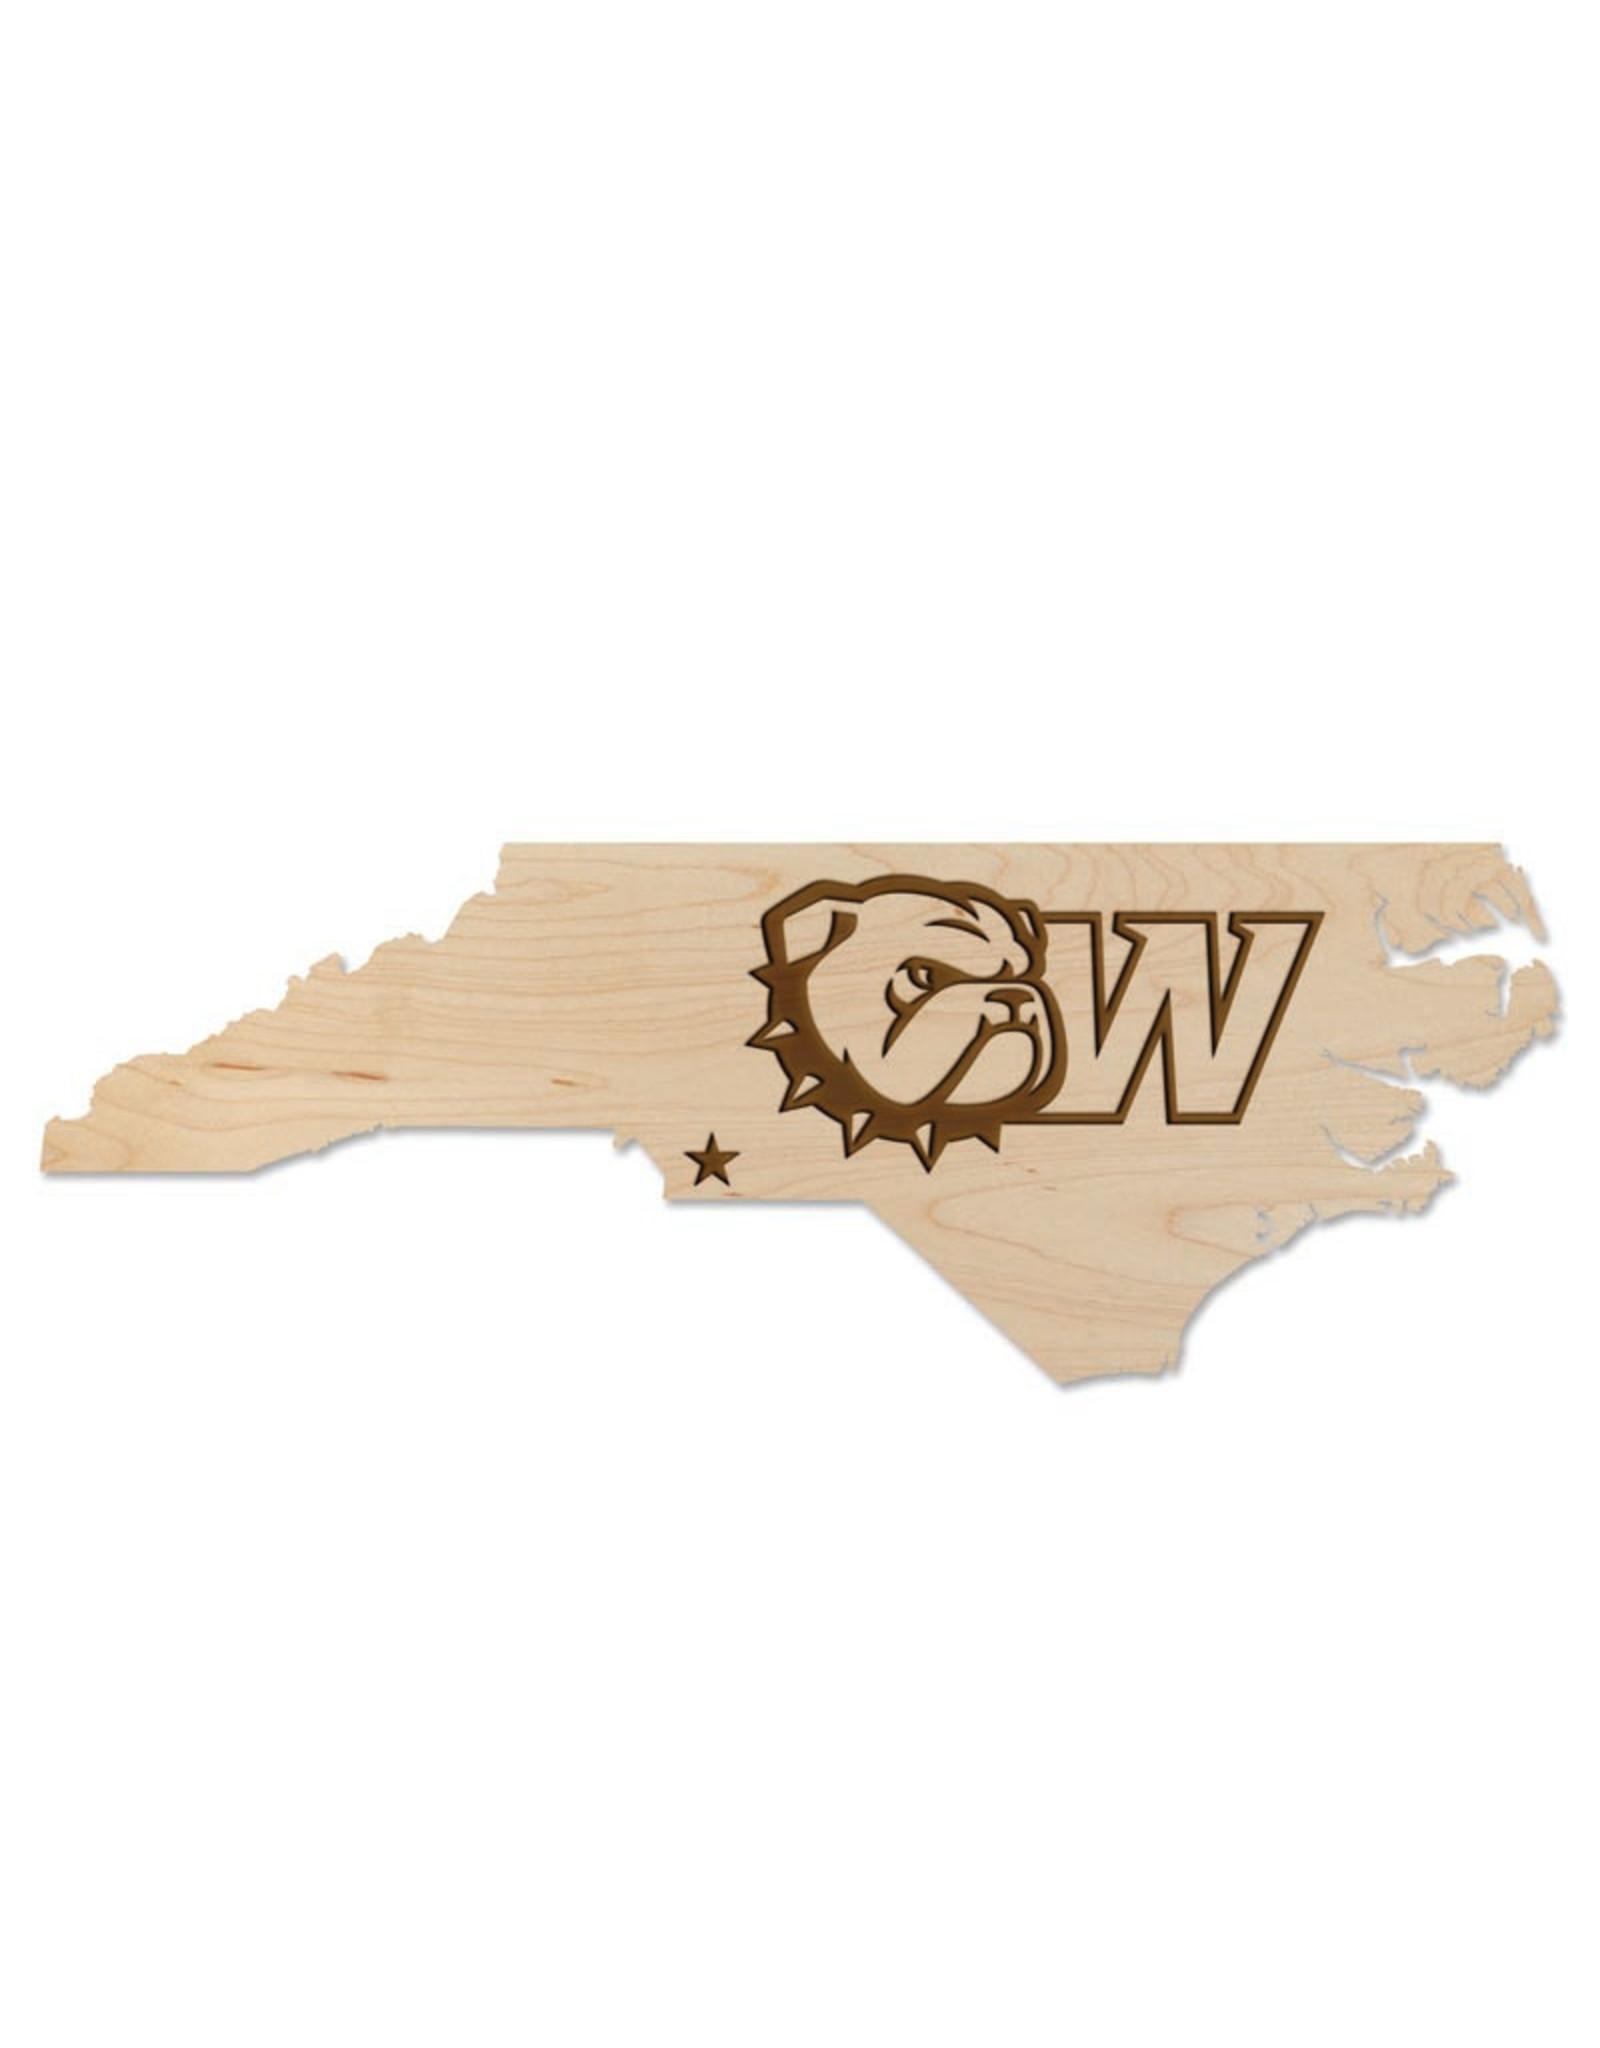 "LazerEdge 24"" x 8"" x .25"" Maple State Wood Wall Hanging New Dog Head W"